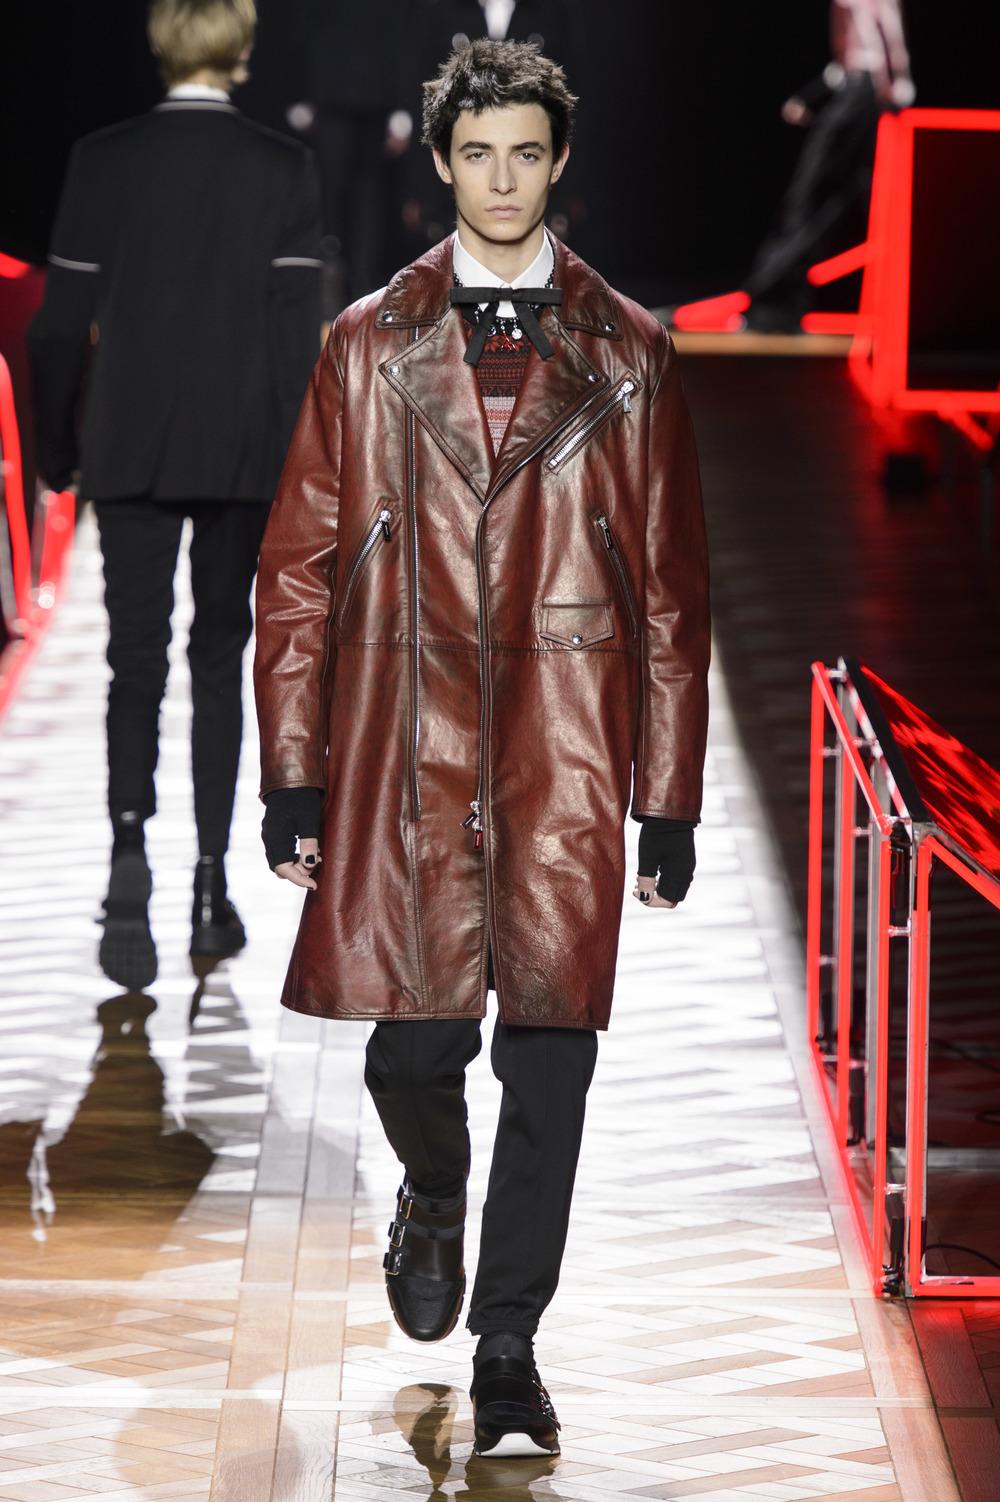 Dior_Homme_Hiver2016-17_look_07.JPG